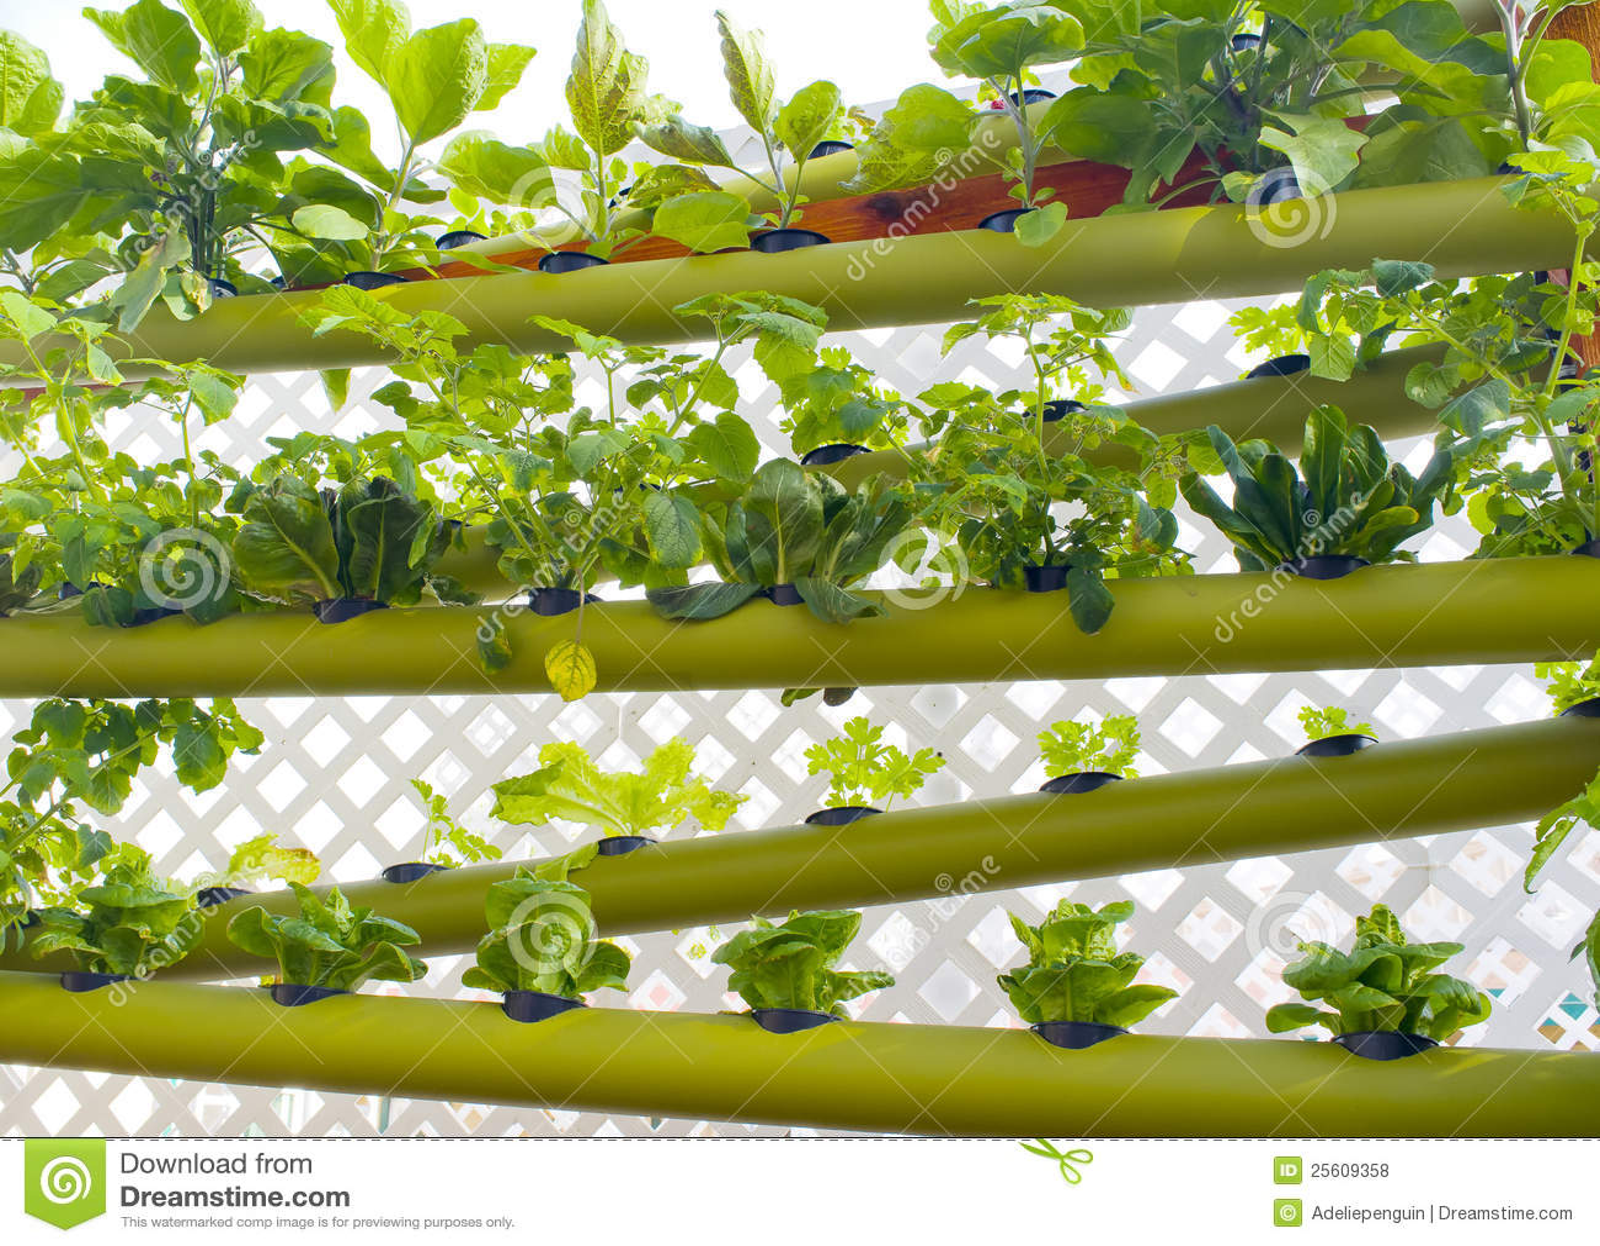 jardim vertical urbano:Hydroponic Vertical Earth Garden